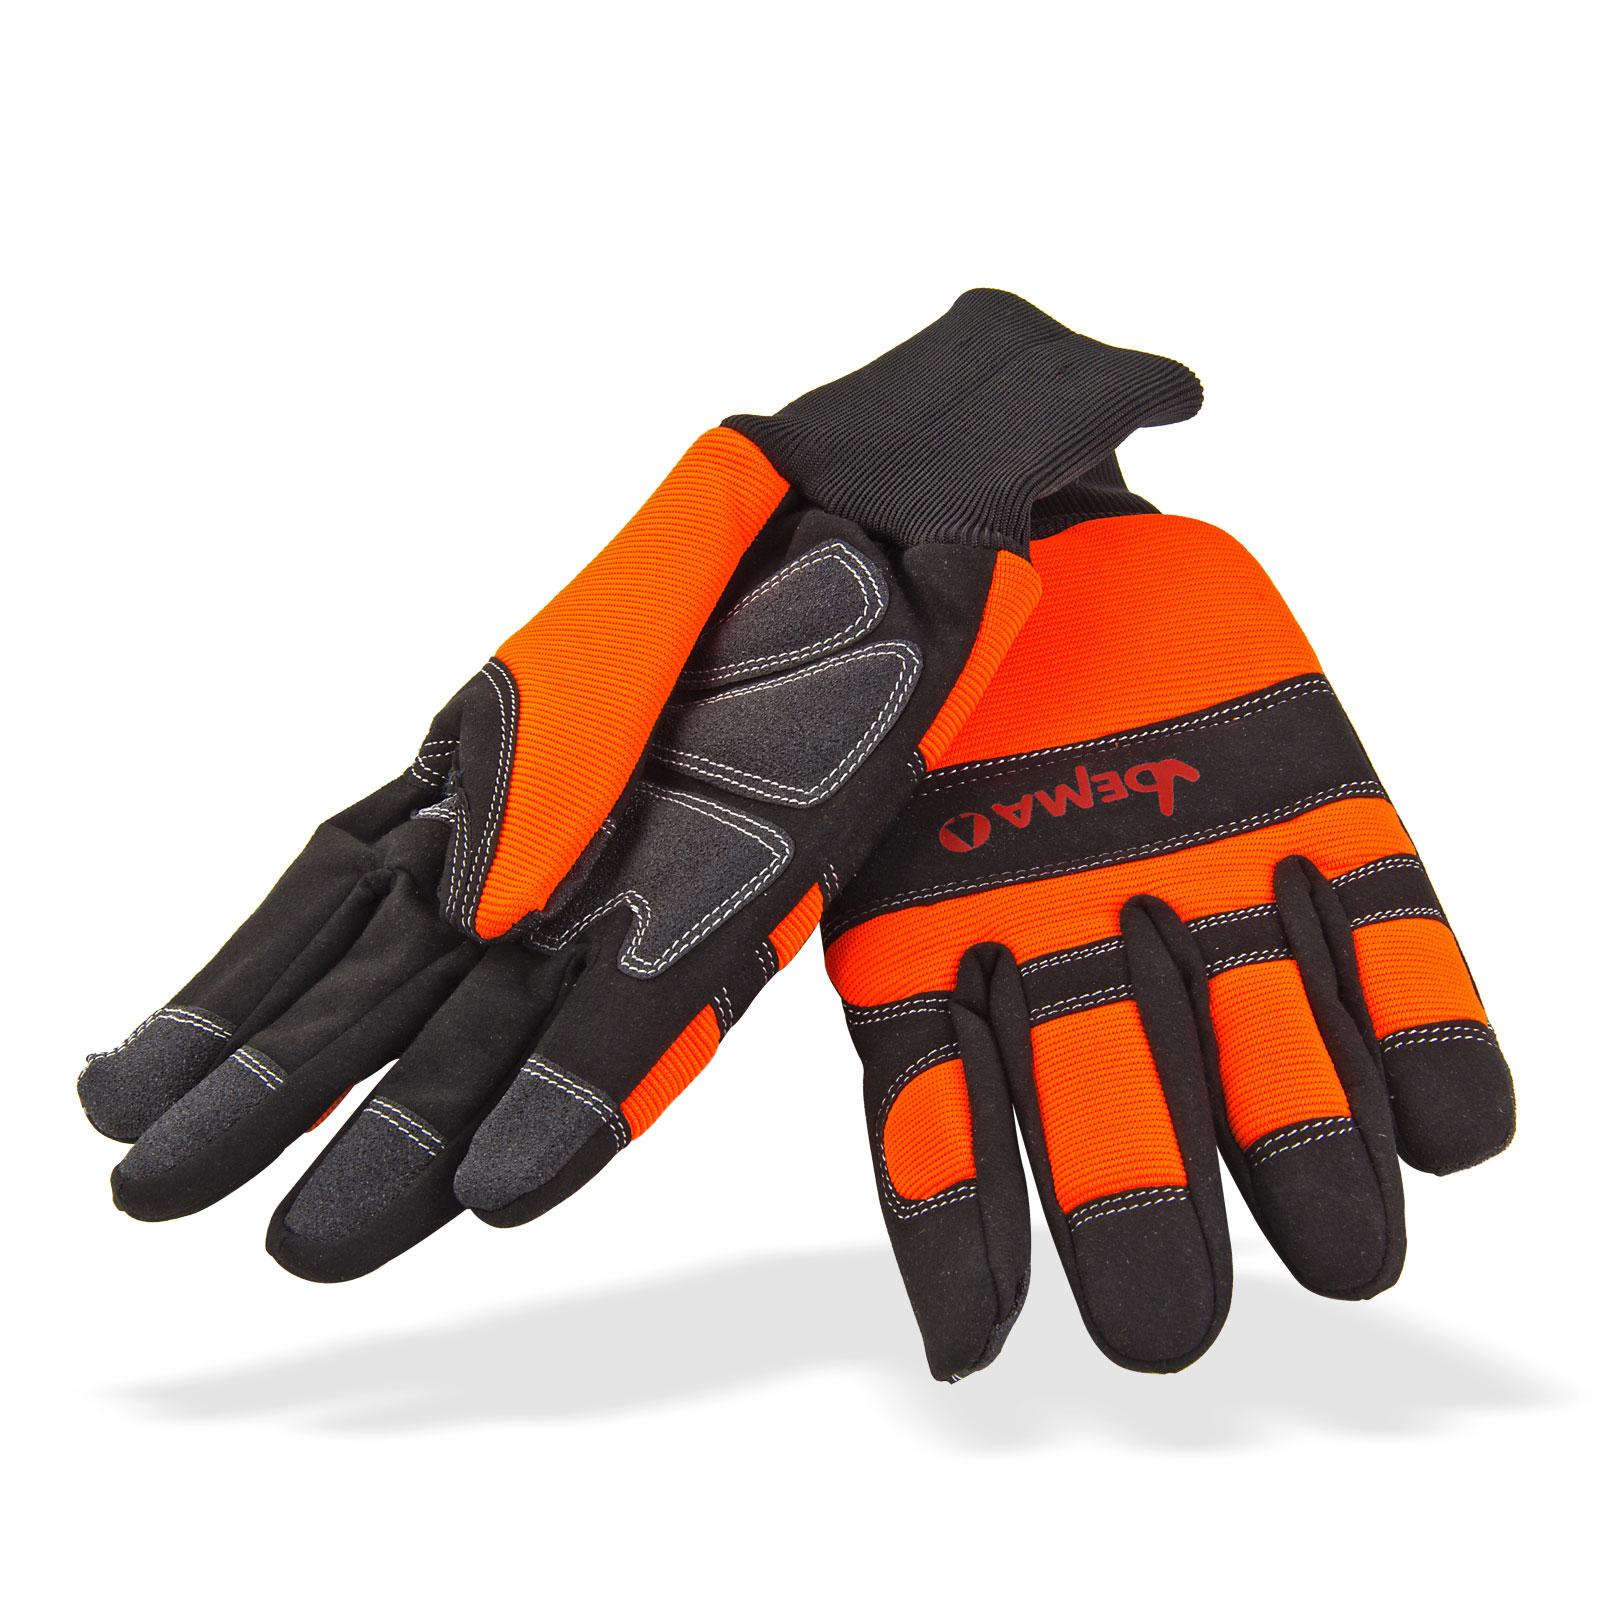 Marken Forst Schnittschutz-Handschuhe KUFSTEIN  Gr. 9-12 Class1 DIN EN 381, Schnitthandschuhe, Schutzhandschuhe Motorsäge Kettensäge, PSA Forst, Schnittschutzhandschuhe, 30246, 30247, 30248, 30249